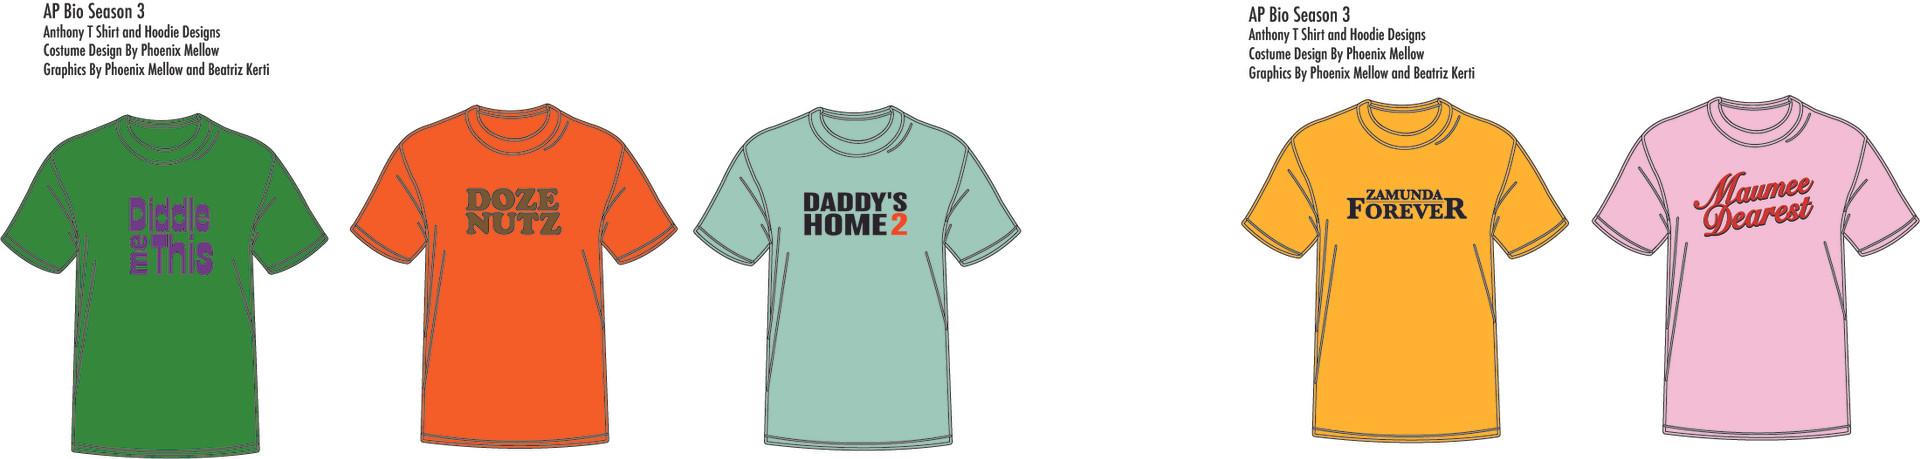 AP Bio: Episode 301, 302, 303, 304, 306 Anthony T Shirts Costume Design By Phoenix Mellow Illustration by Phoenix Mellow and Beatriz Kerti